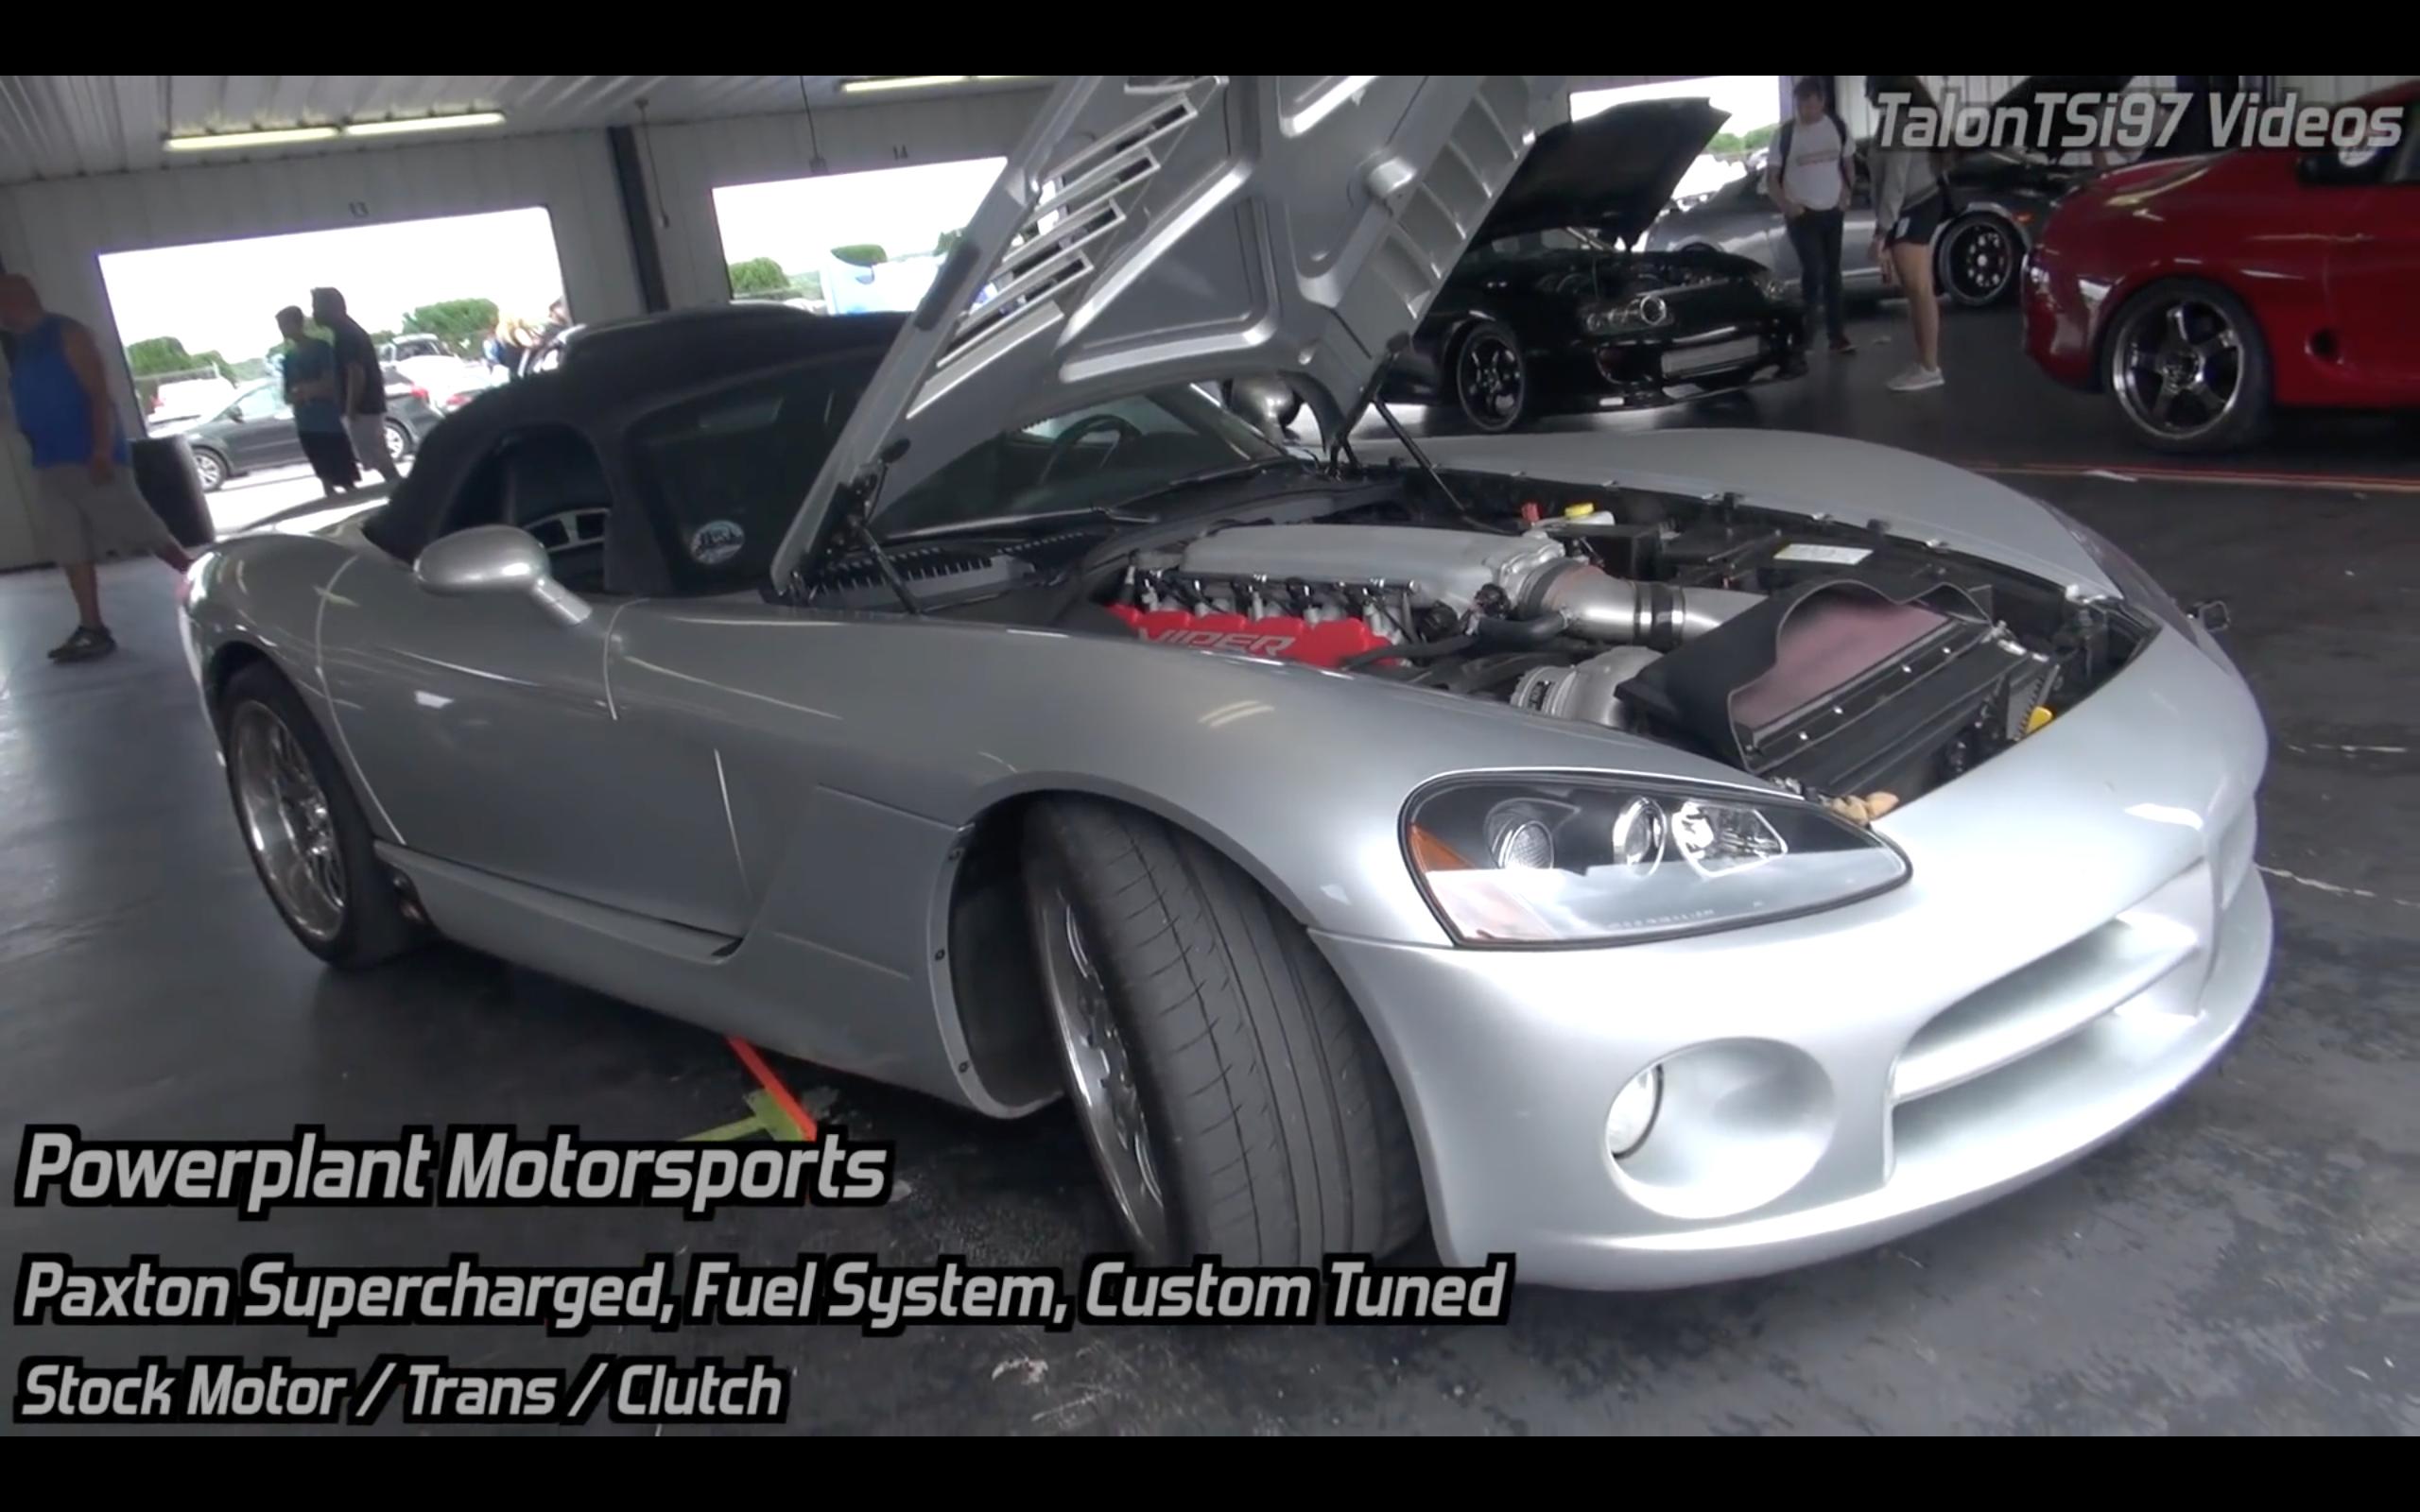 Video Blown Dodge Viper Srt 10 Vs The World Roll Dig Racing